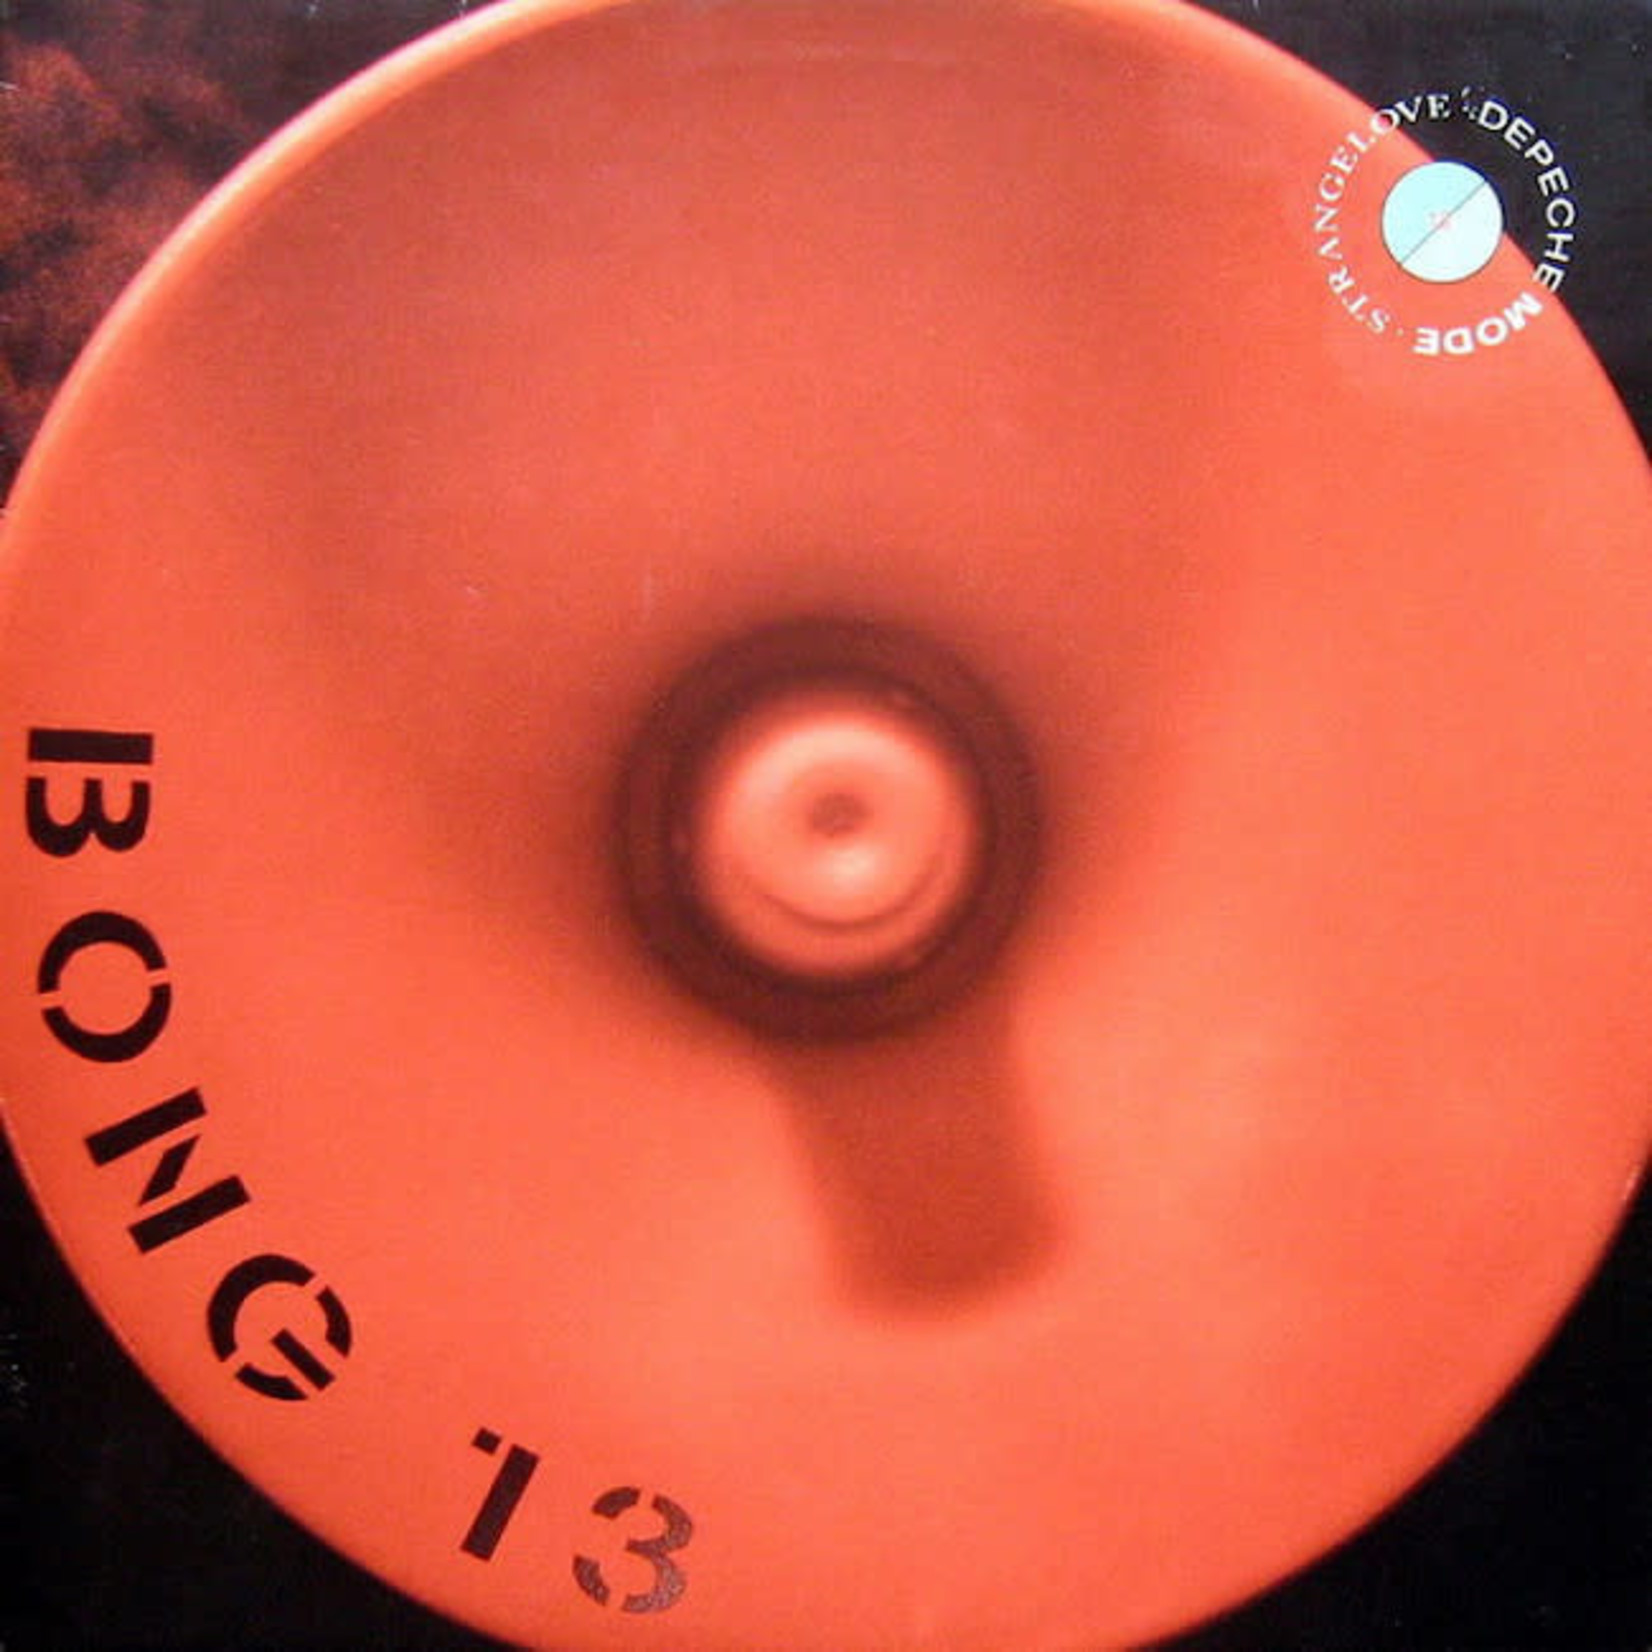 [Vintage] Depeche Mode: Strangelove (12'', Canada)